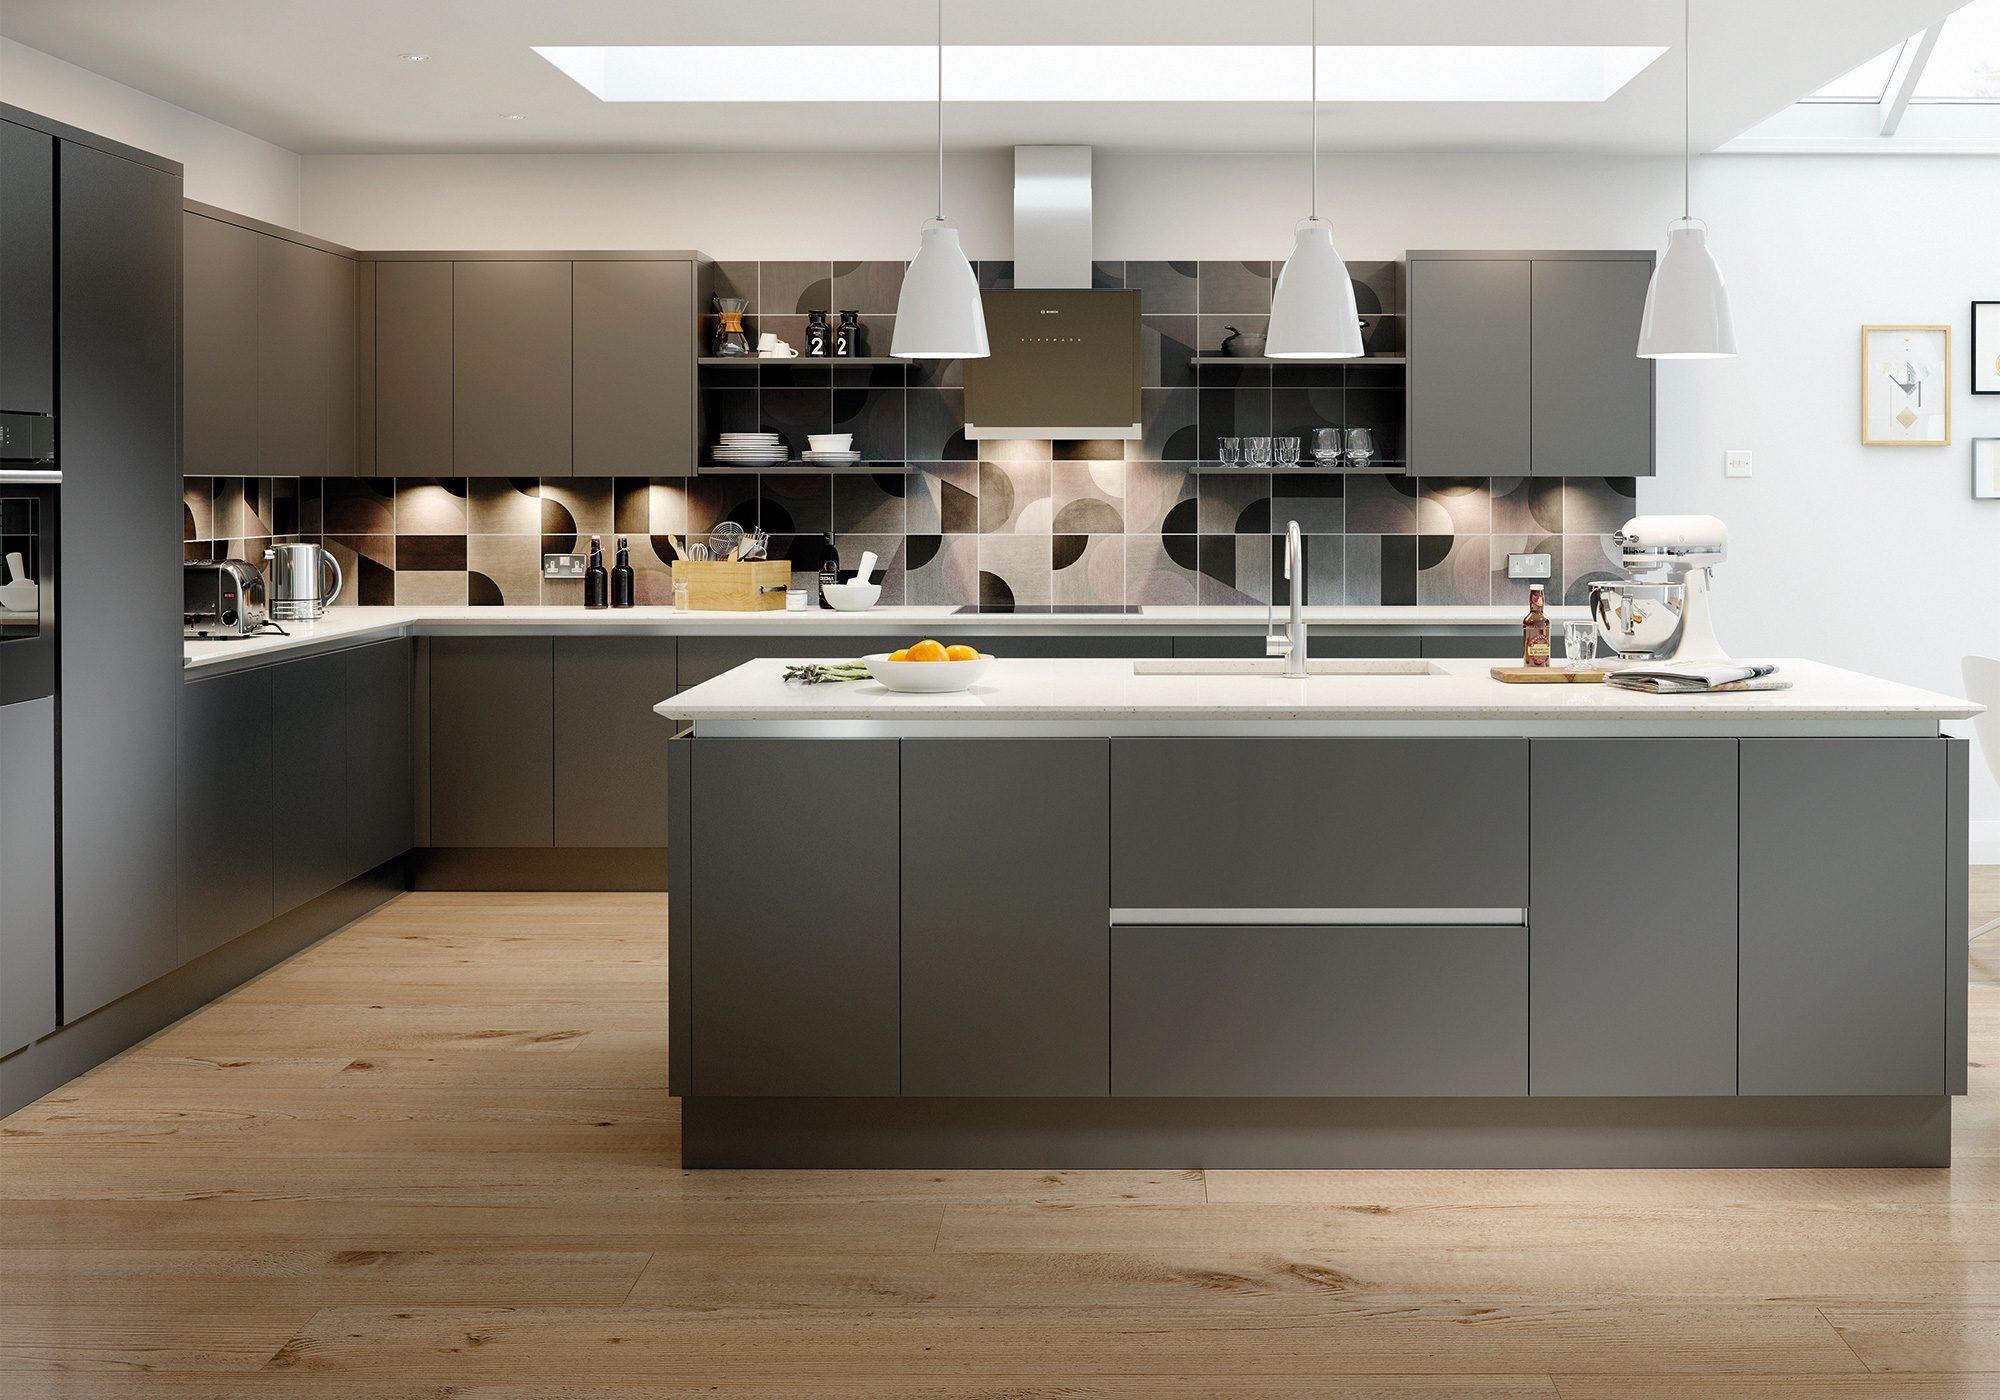 Kitchens - Fairprice Kitchens